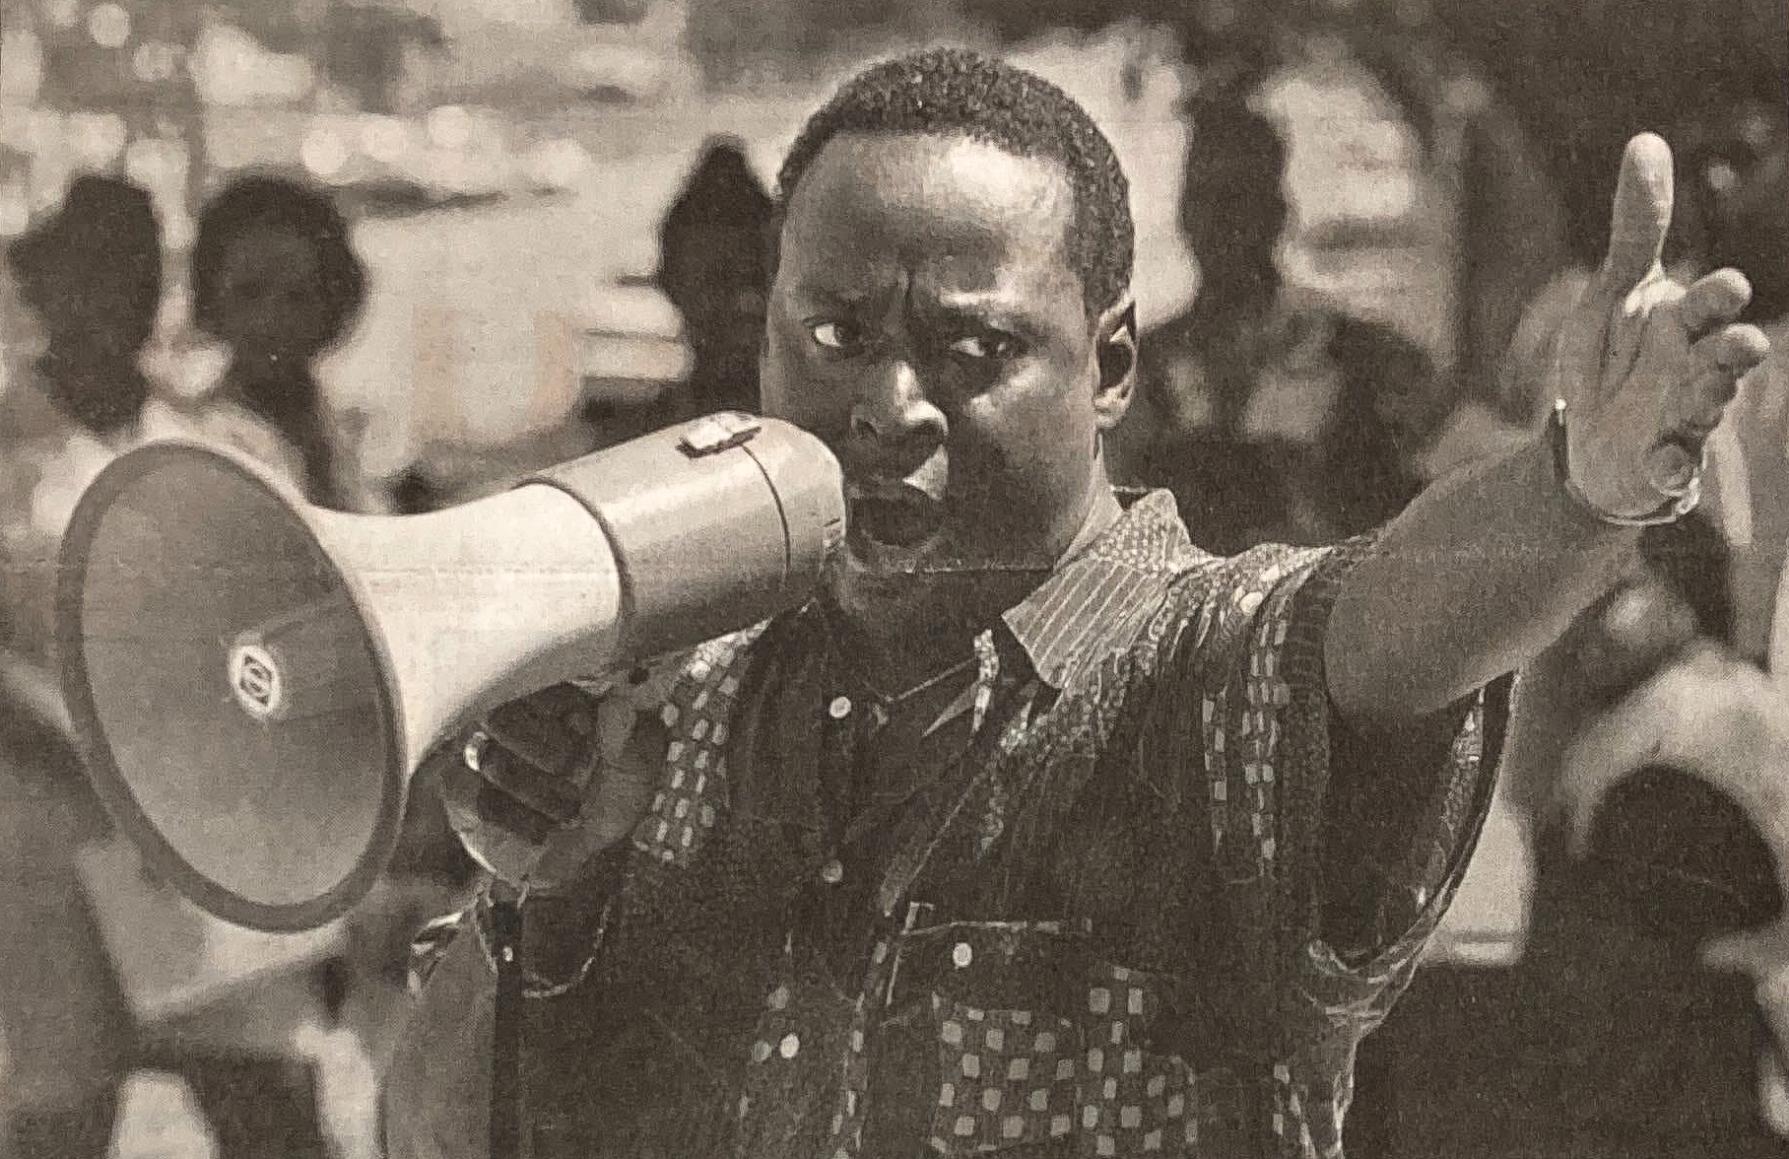 Black on Campus: The history of integration, representation at UTA